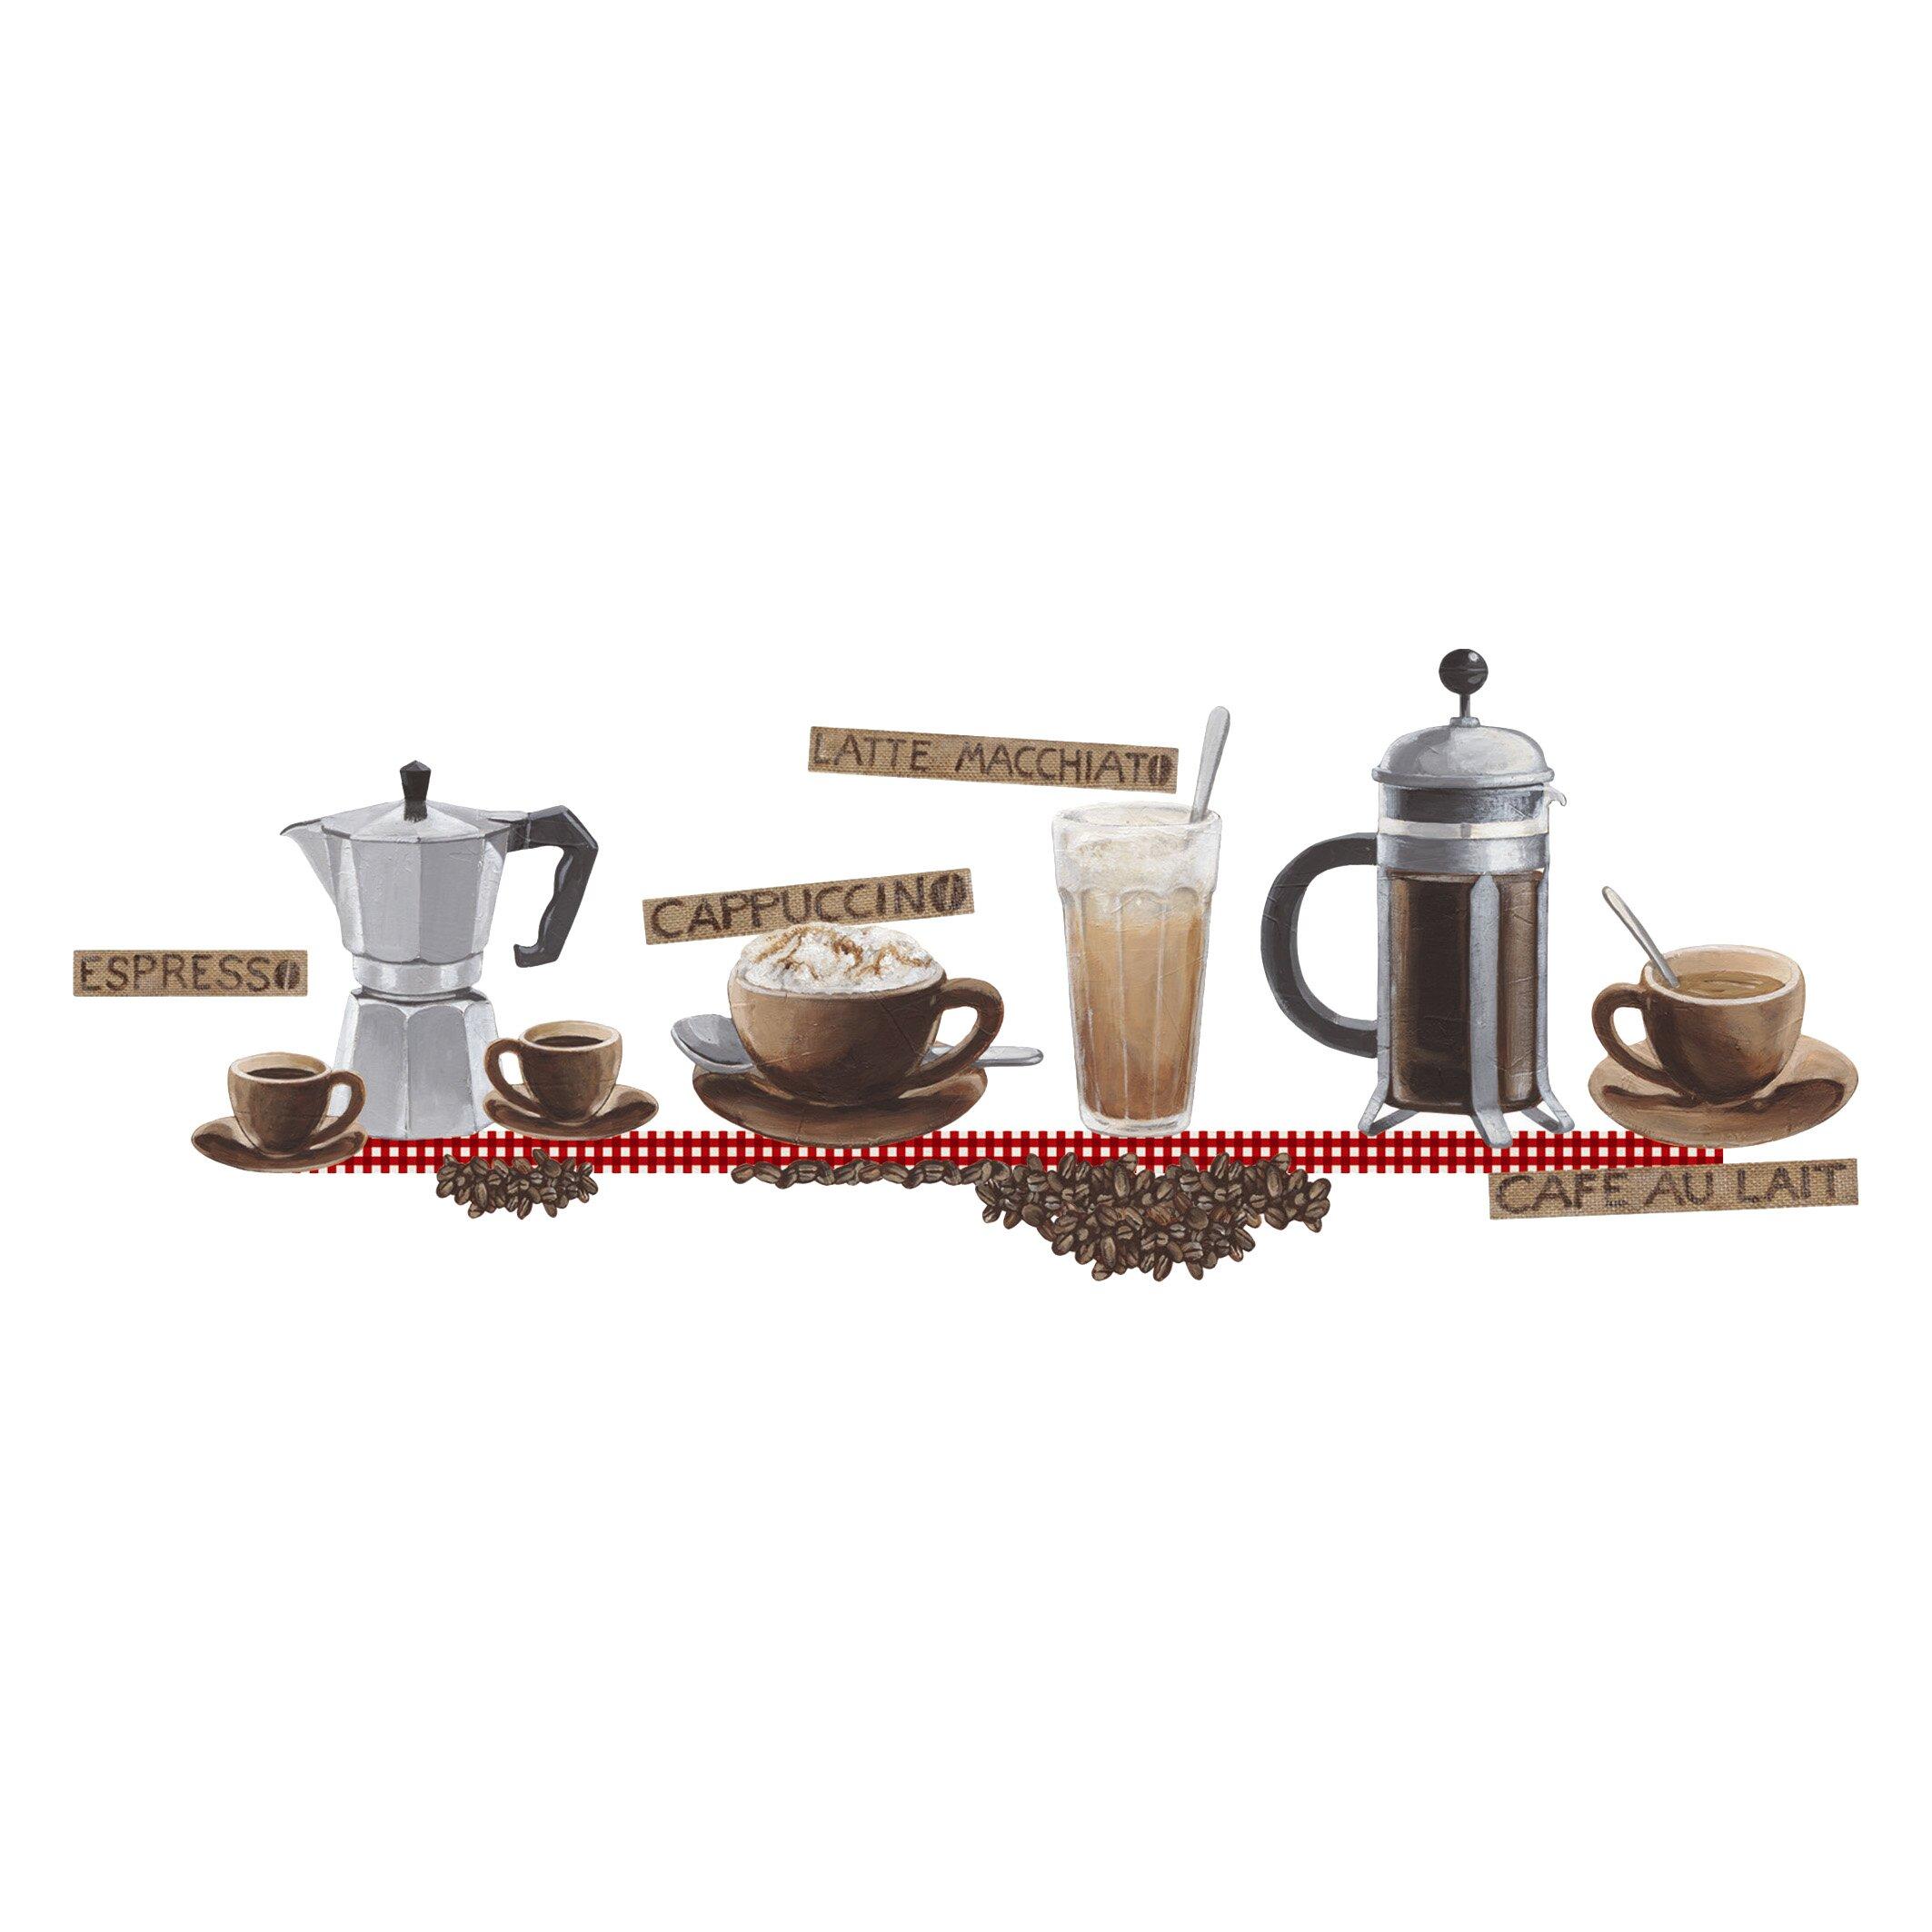 eurographics coffee wall sticker wayfair uk coffee wall stickers reviews online shopping coffee wall